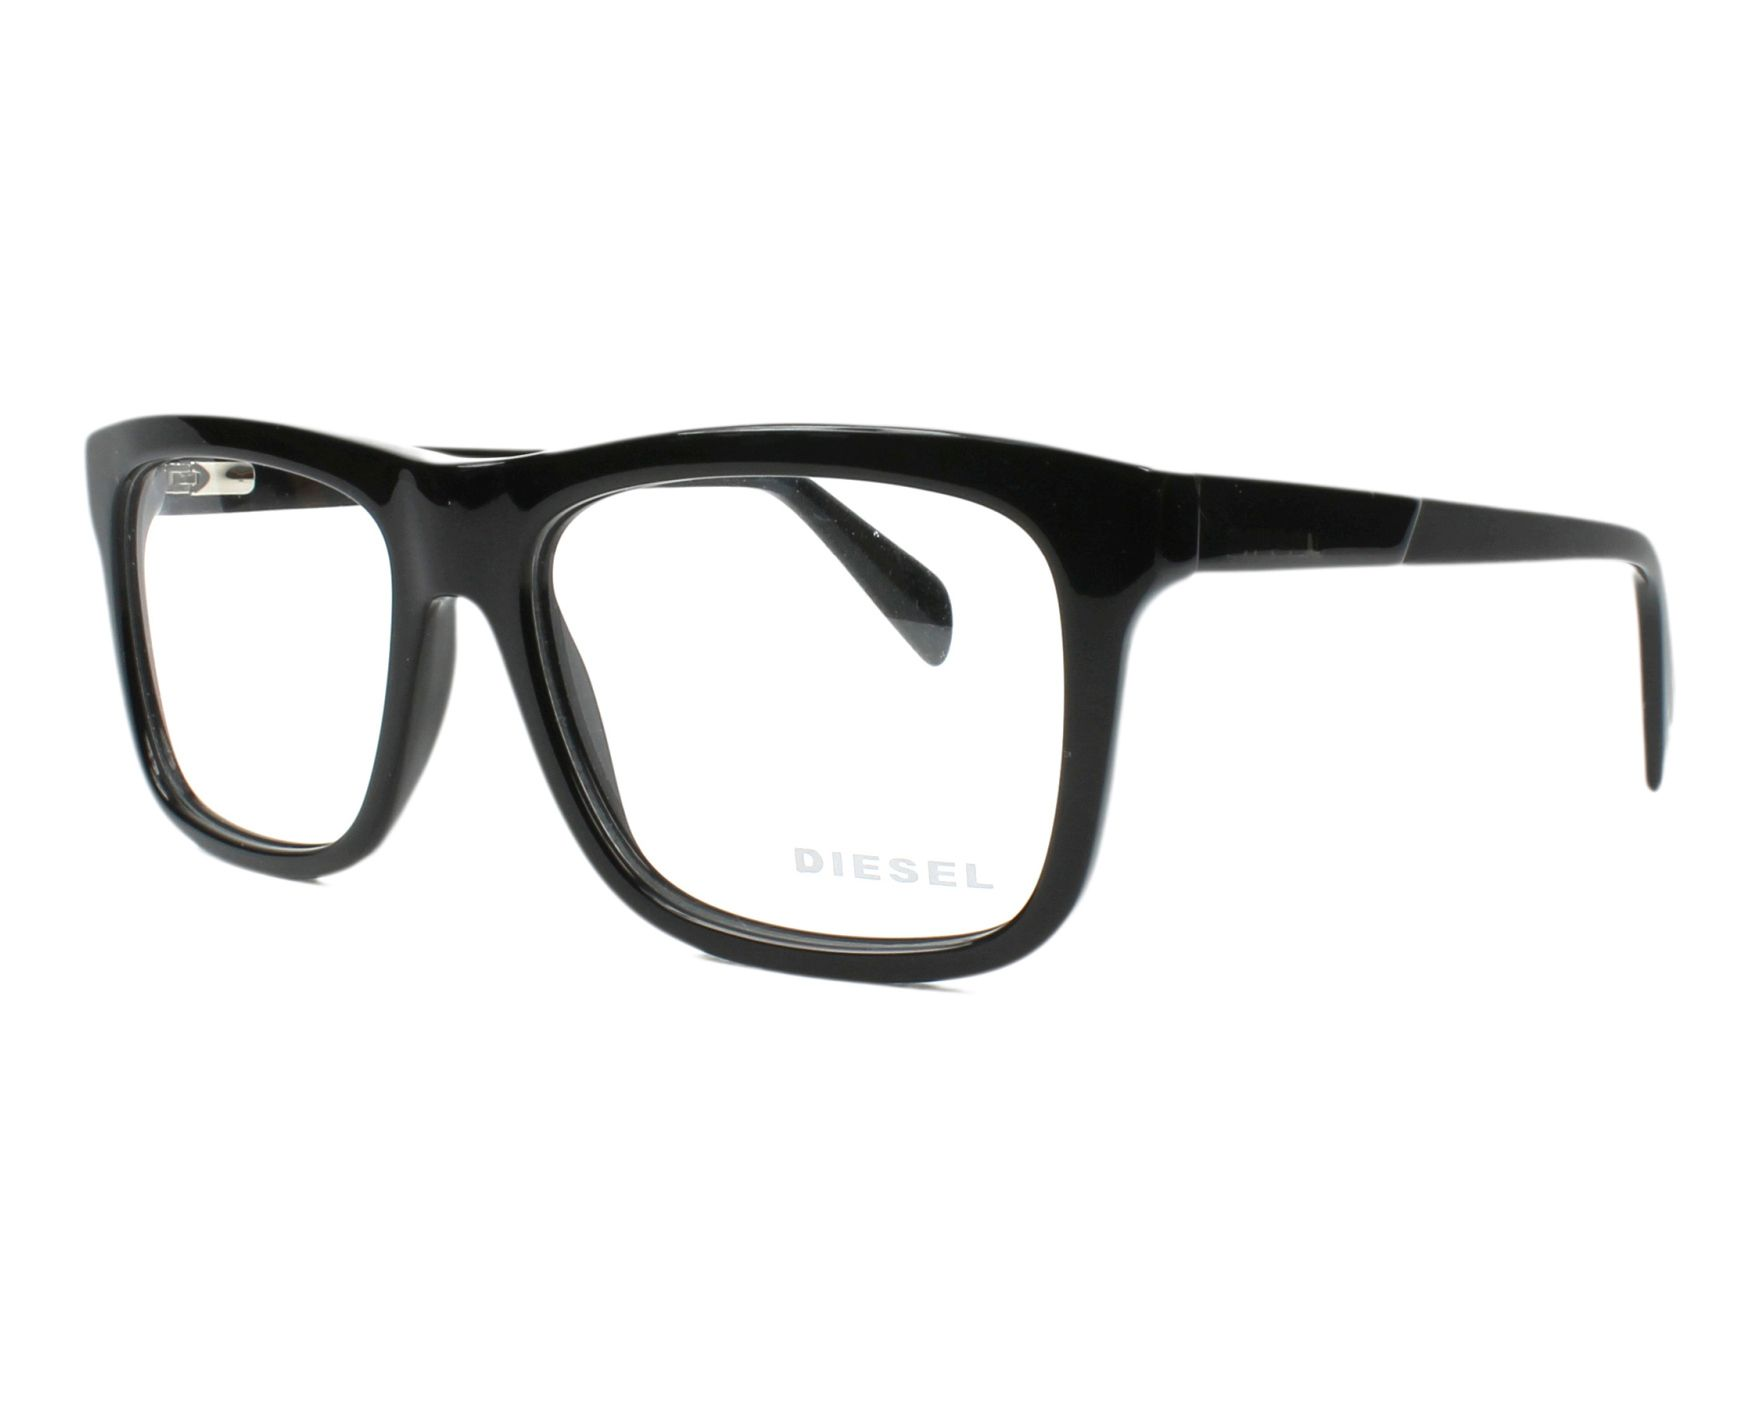 lunettes de vue de diesel en dl 5118 001. Black Bedroom Furniture Sets. Home Design Ideas